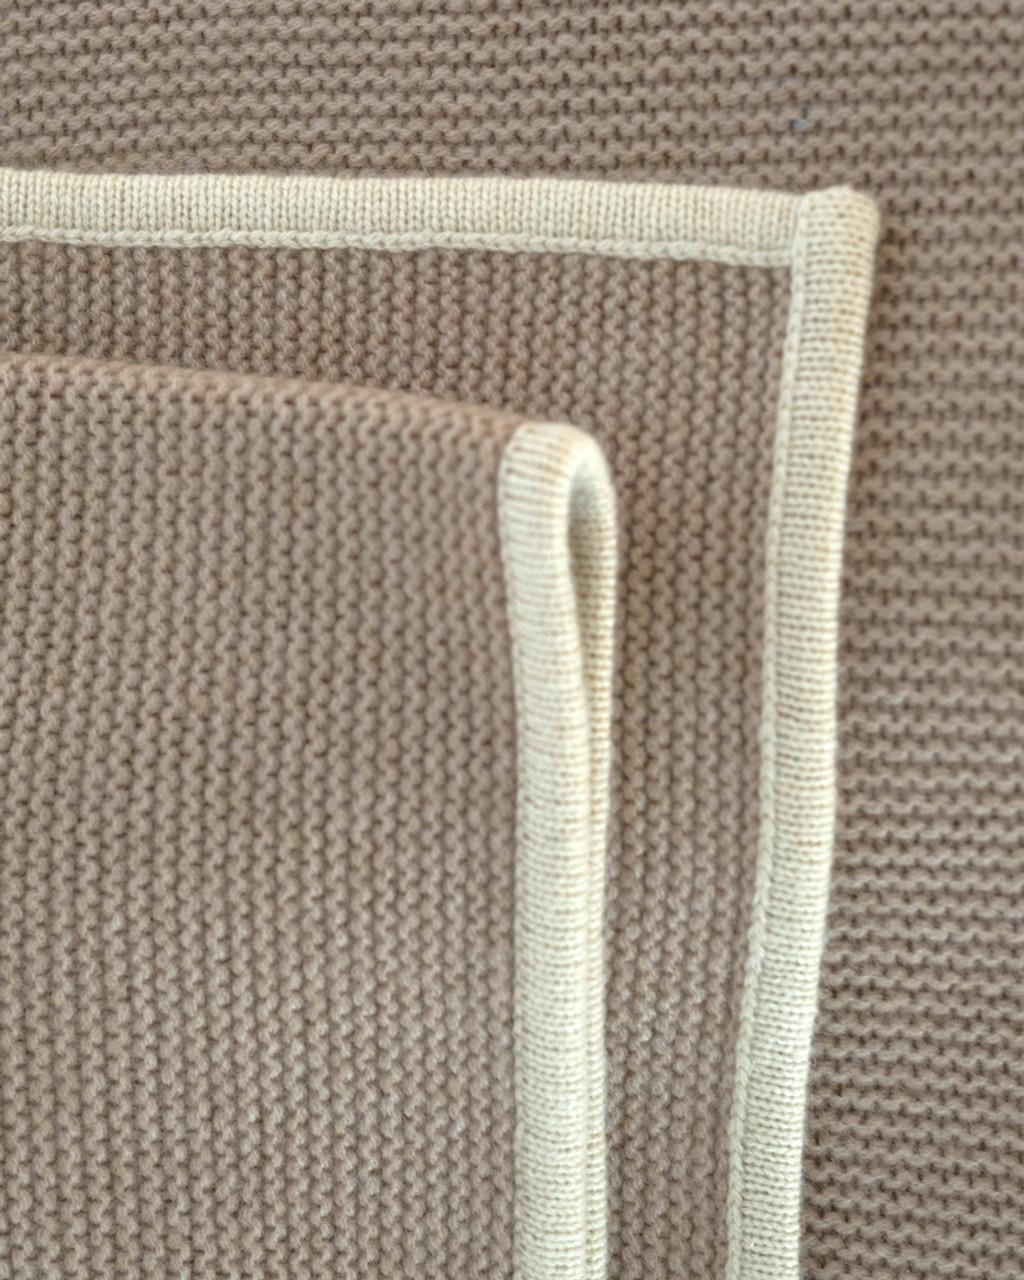 Soft Tan  & Cream Purl Knit Cashmere Throw